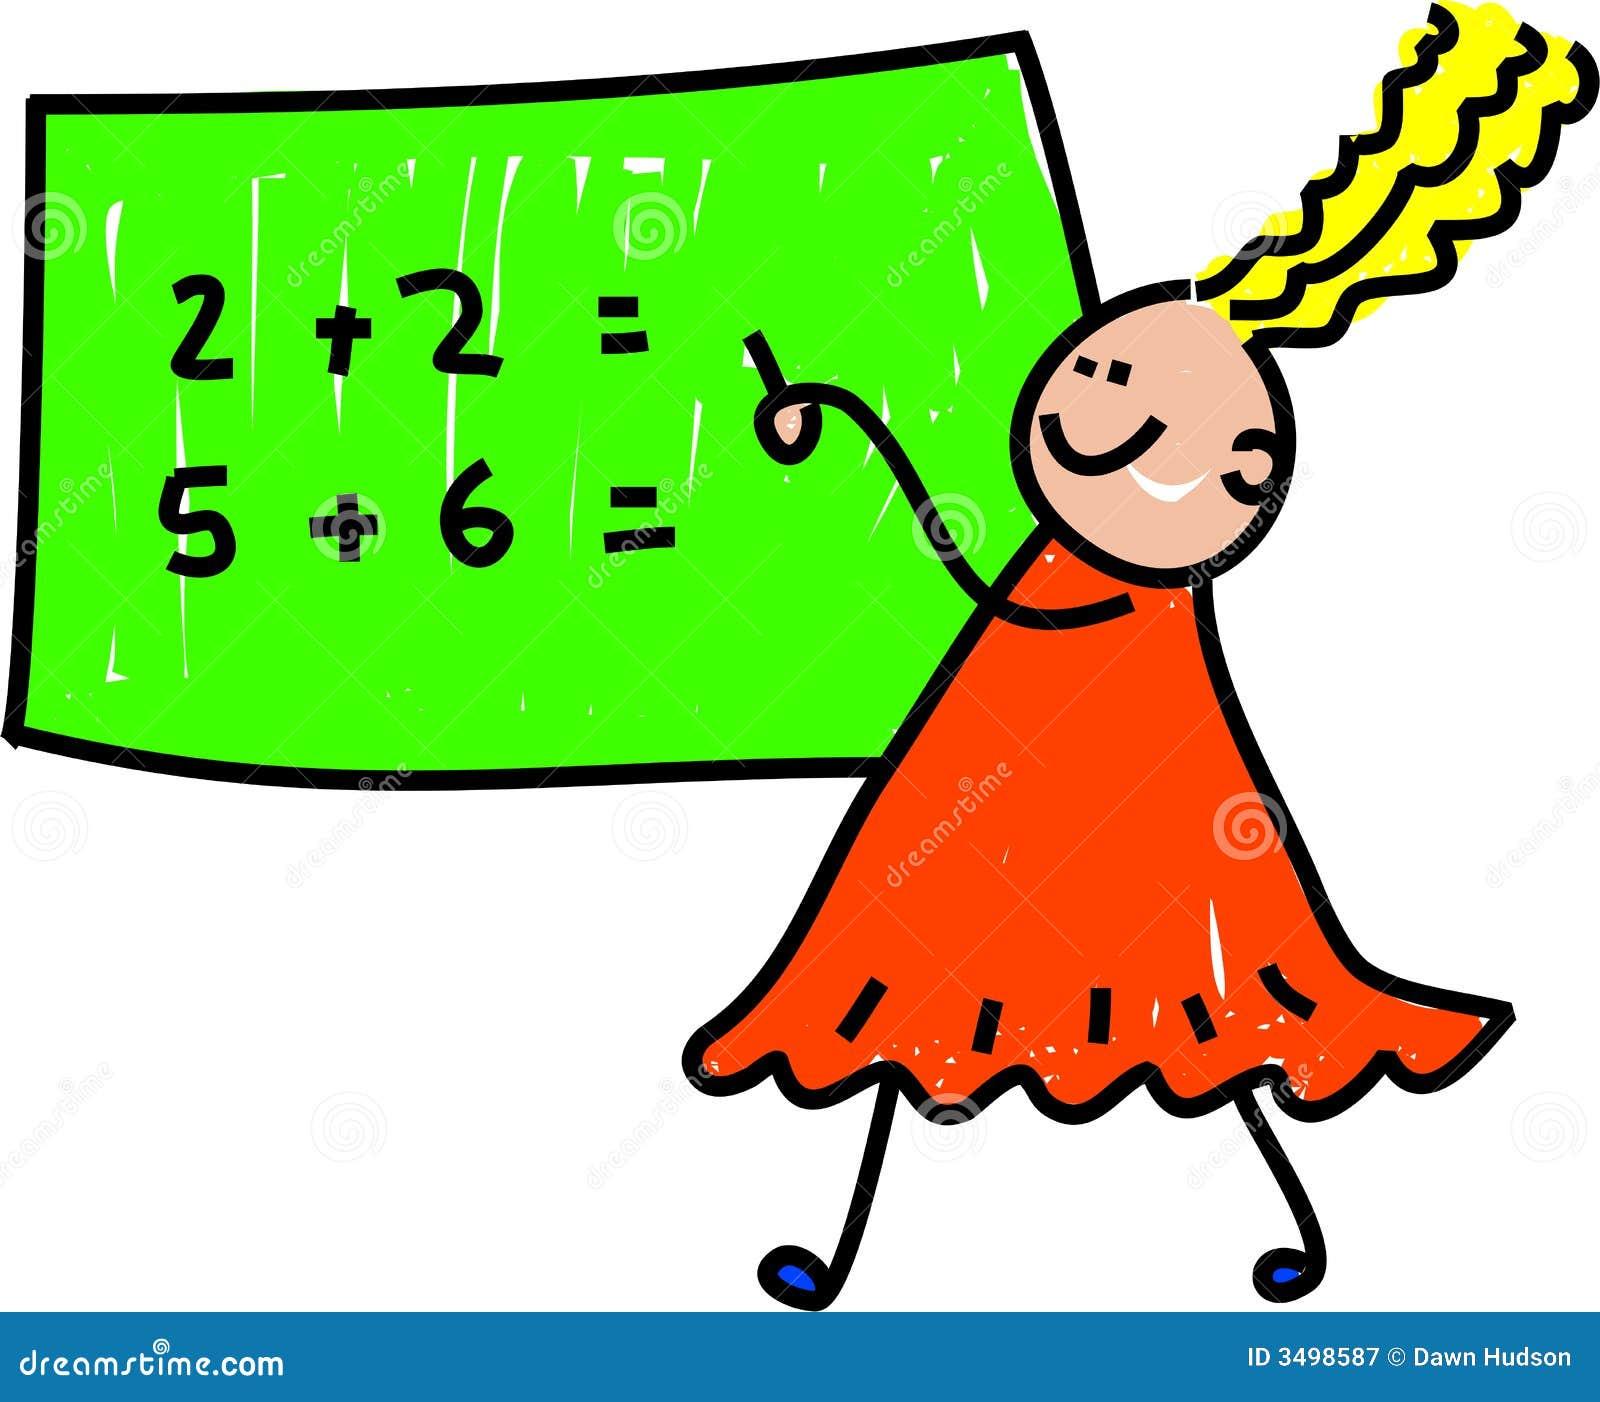 Famous Math For Little Kids Contemporary - Worksheet Mathematics ...